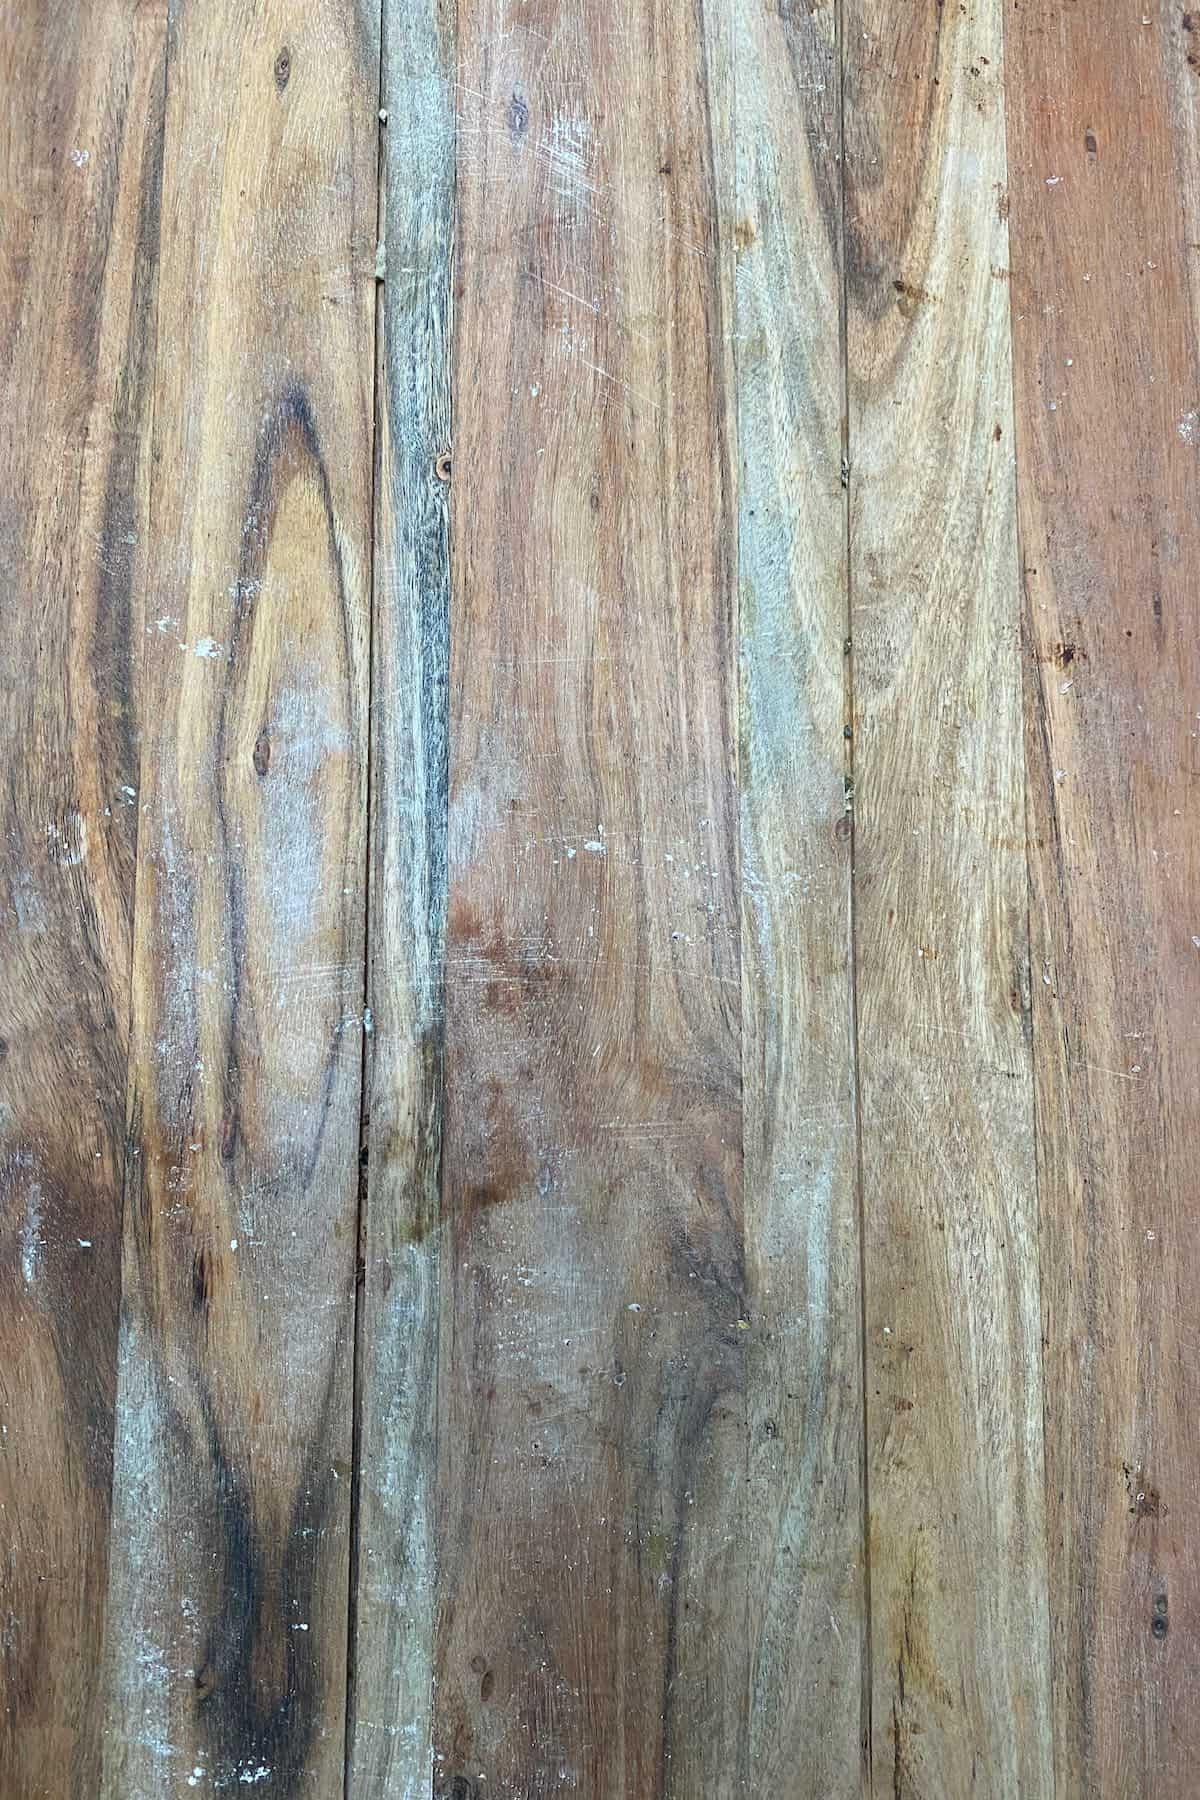 A dirty wooden cutting board